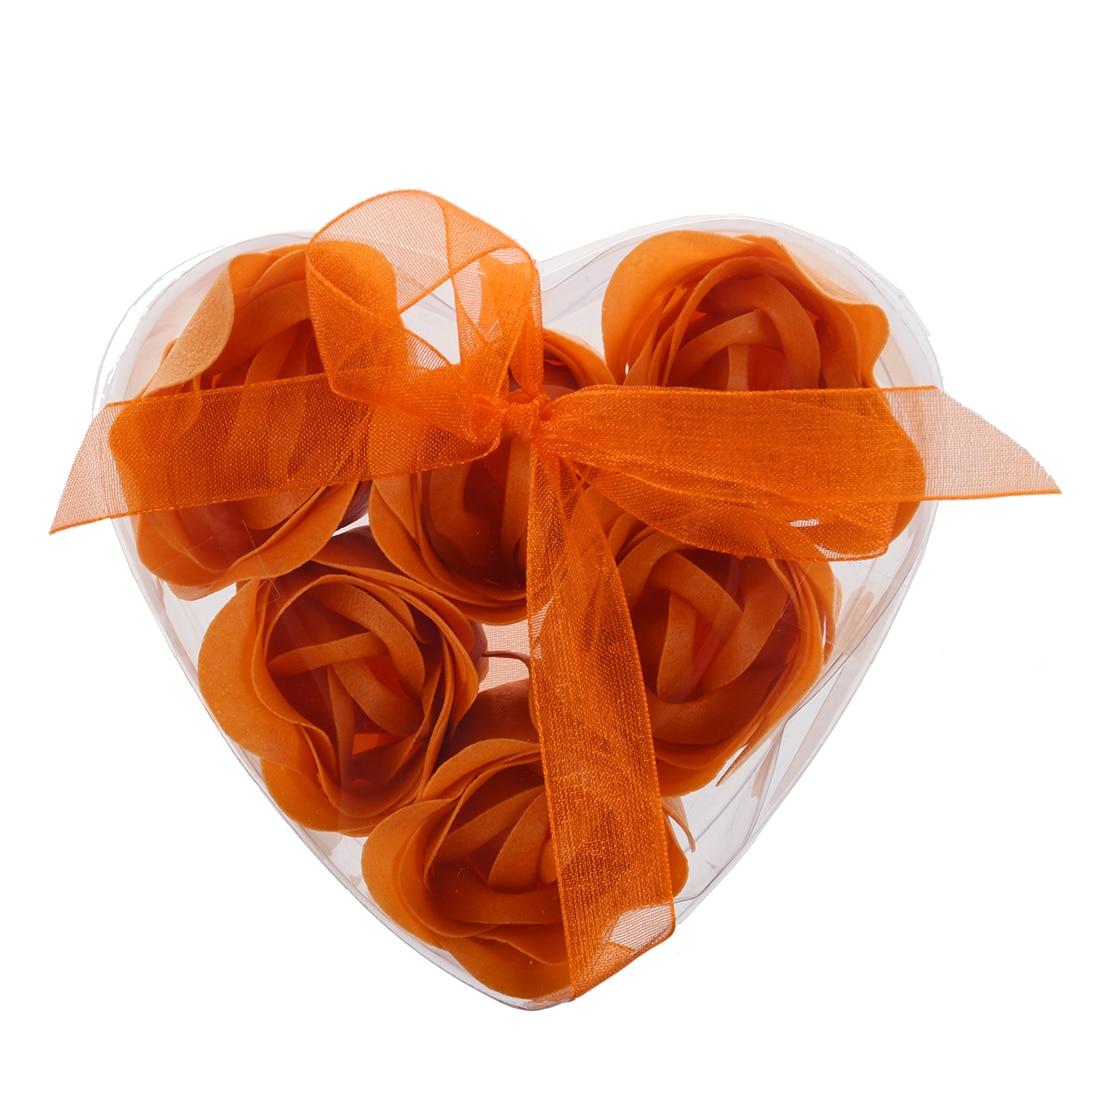 New 6 Pcs Rose Flower Scented Bath Soap Petals Orange W Heart Shape Box